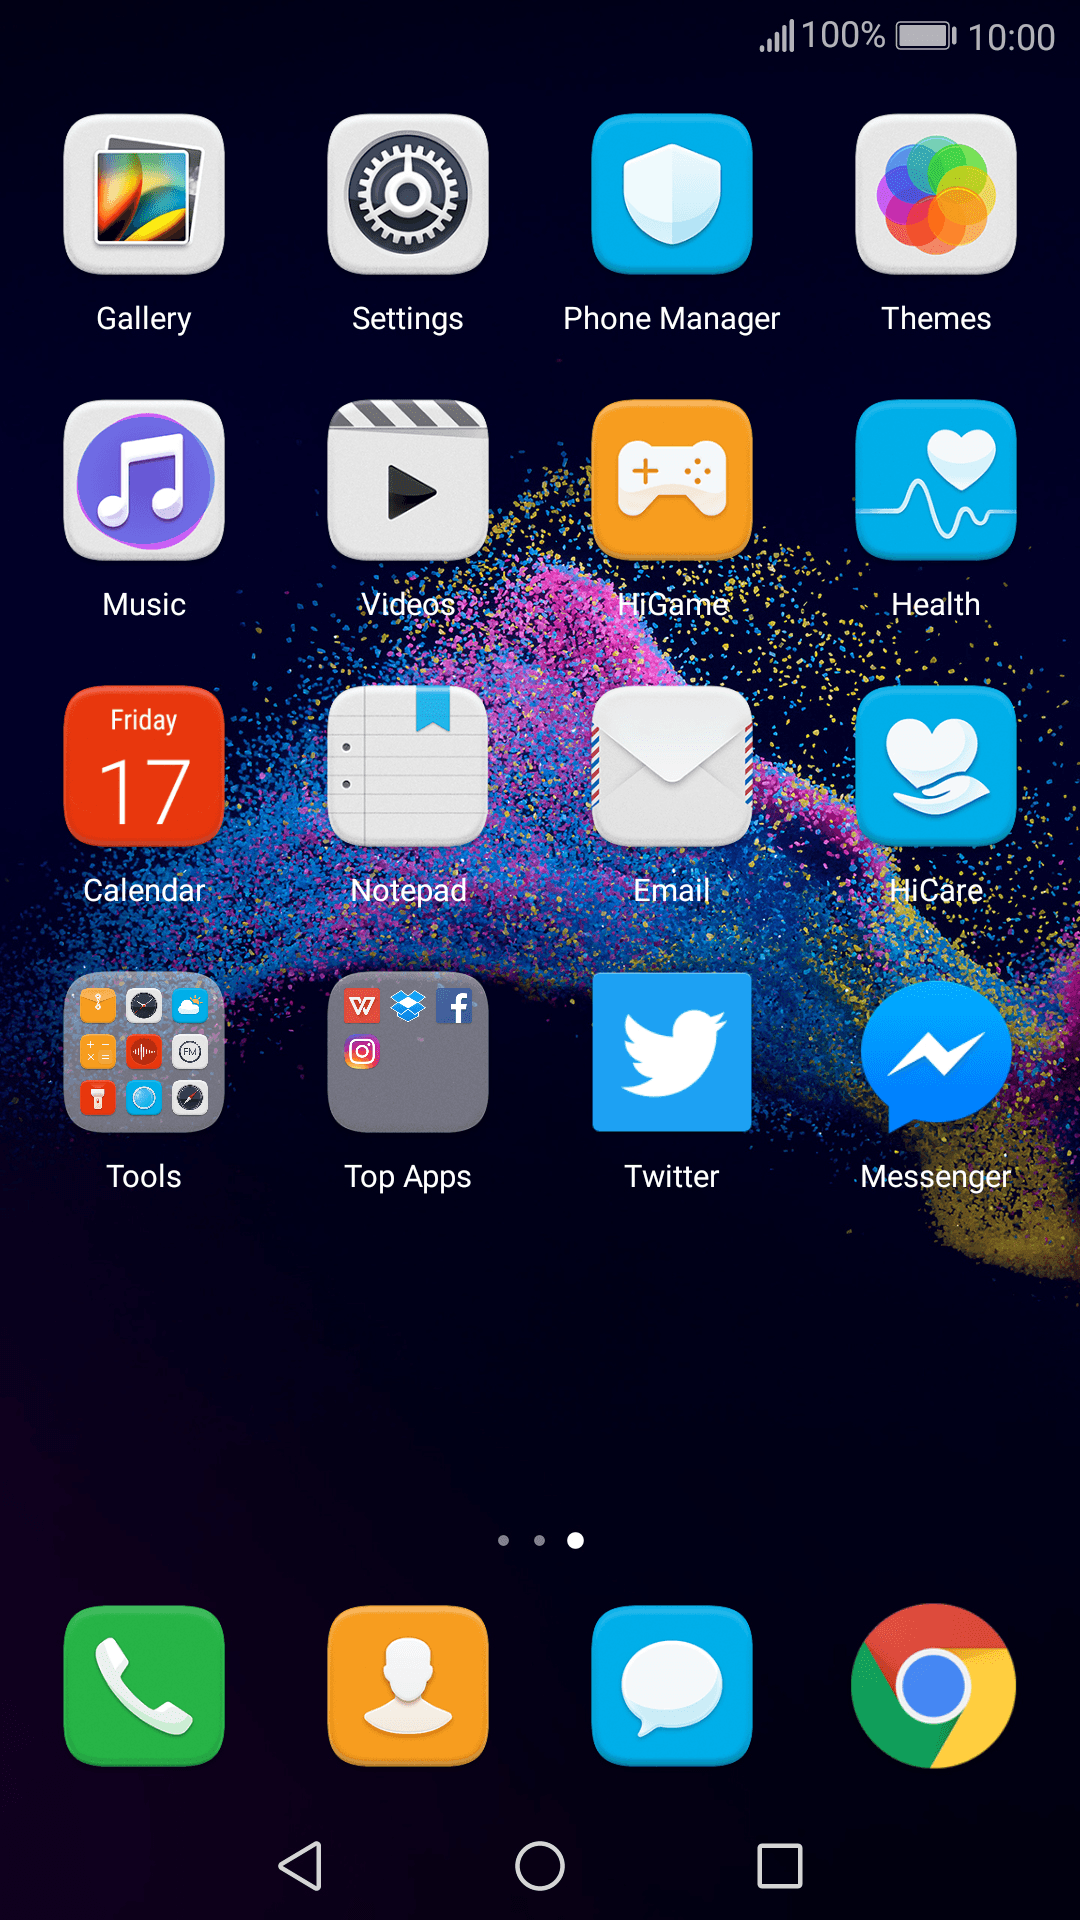 Huawei p8 lite background data